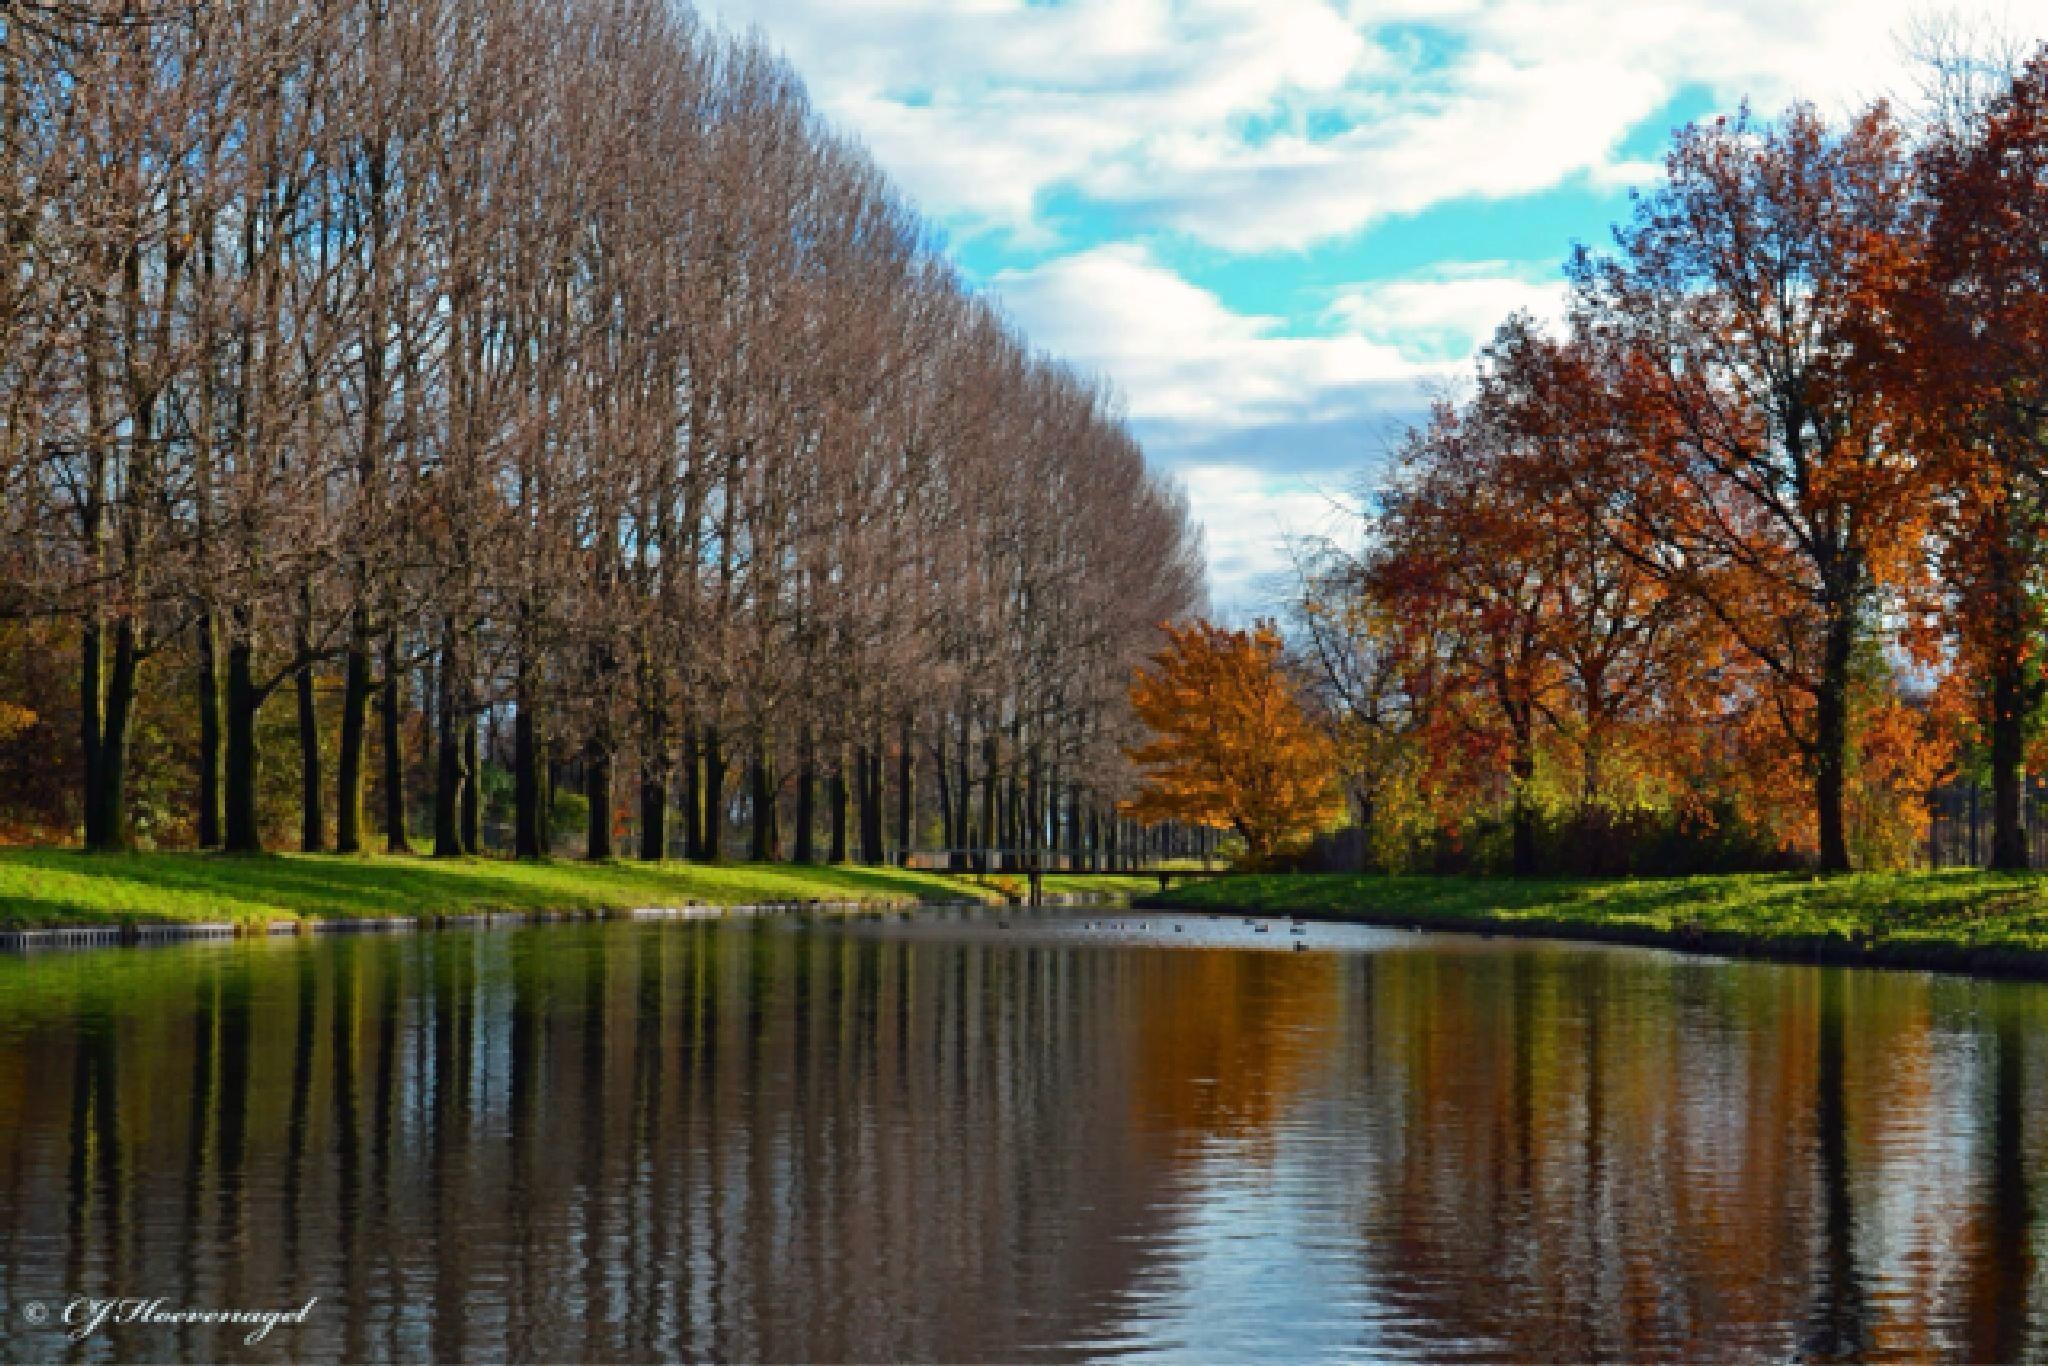 Autumn by Cassy Hoevenagel